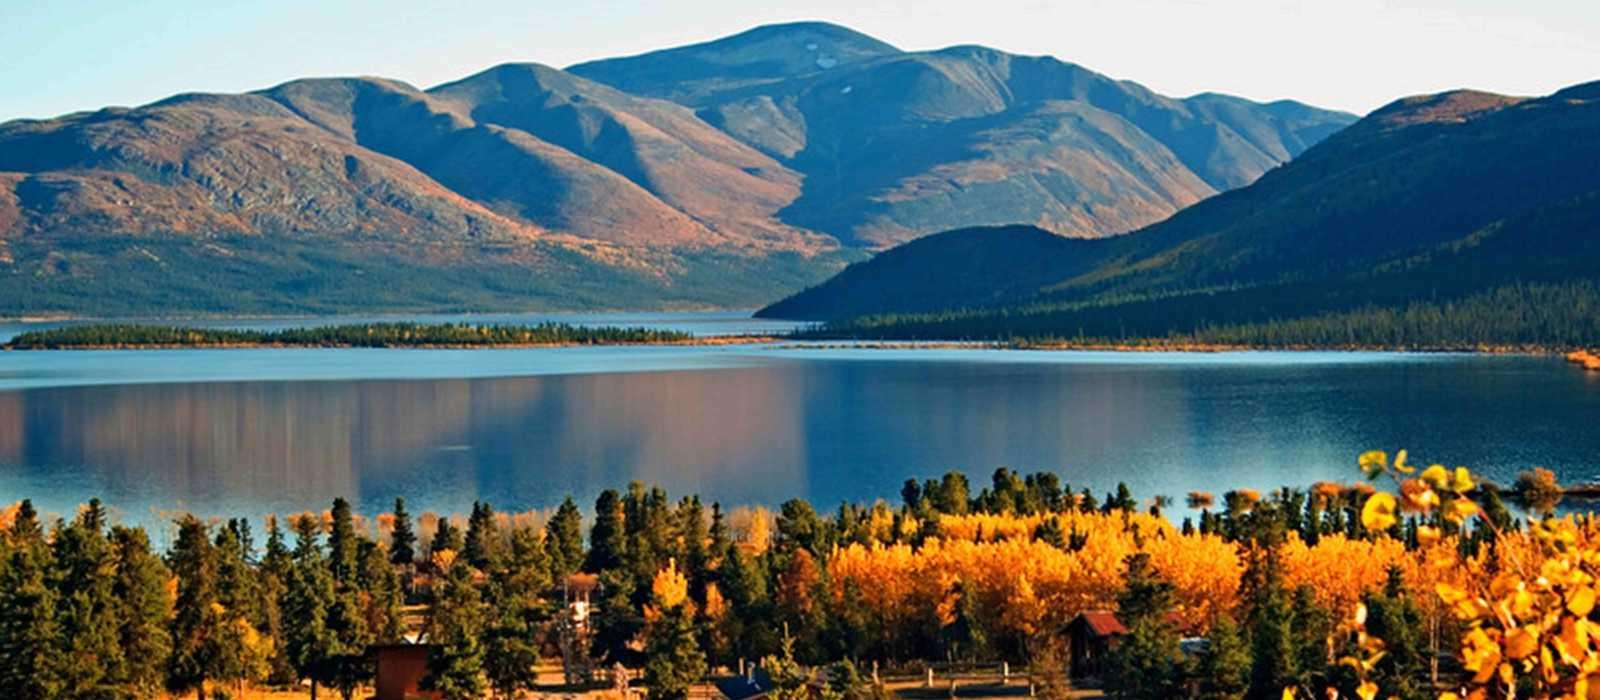 Sky High Wilderness im Herbst